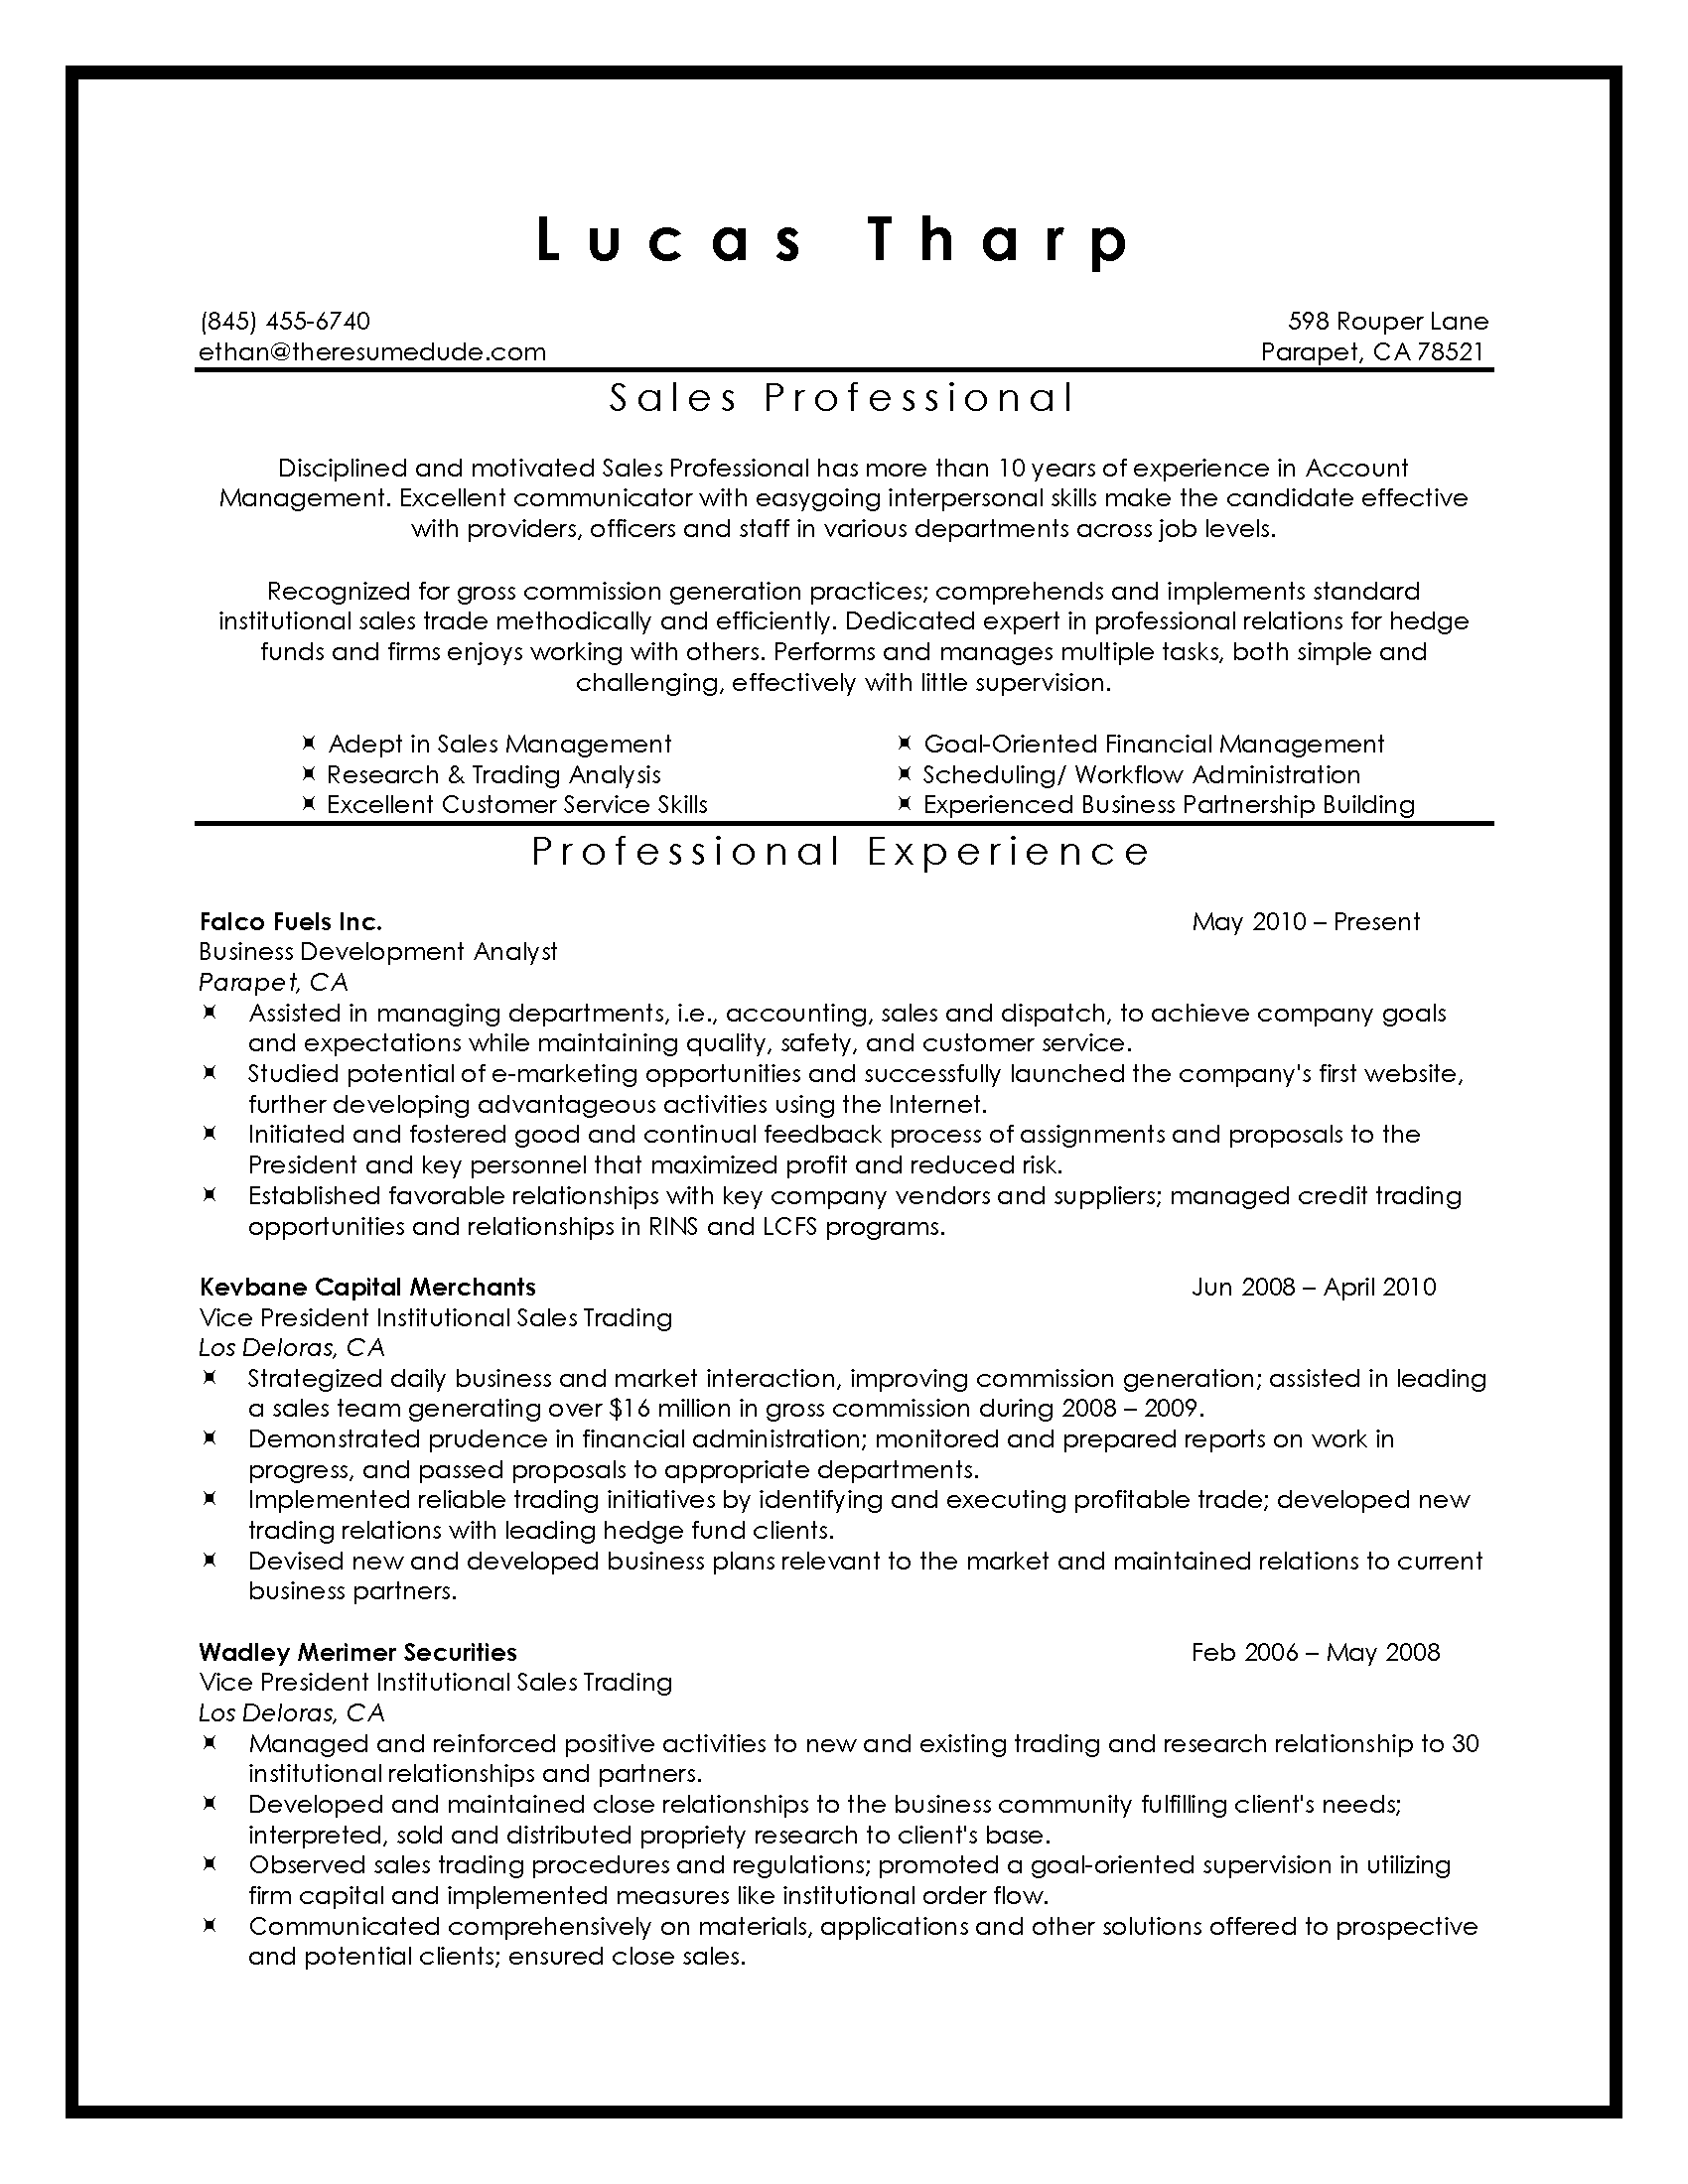 sales resume writing sample - Professional Resume Writing